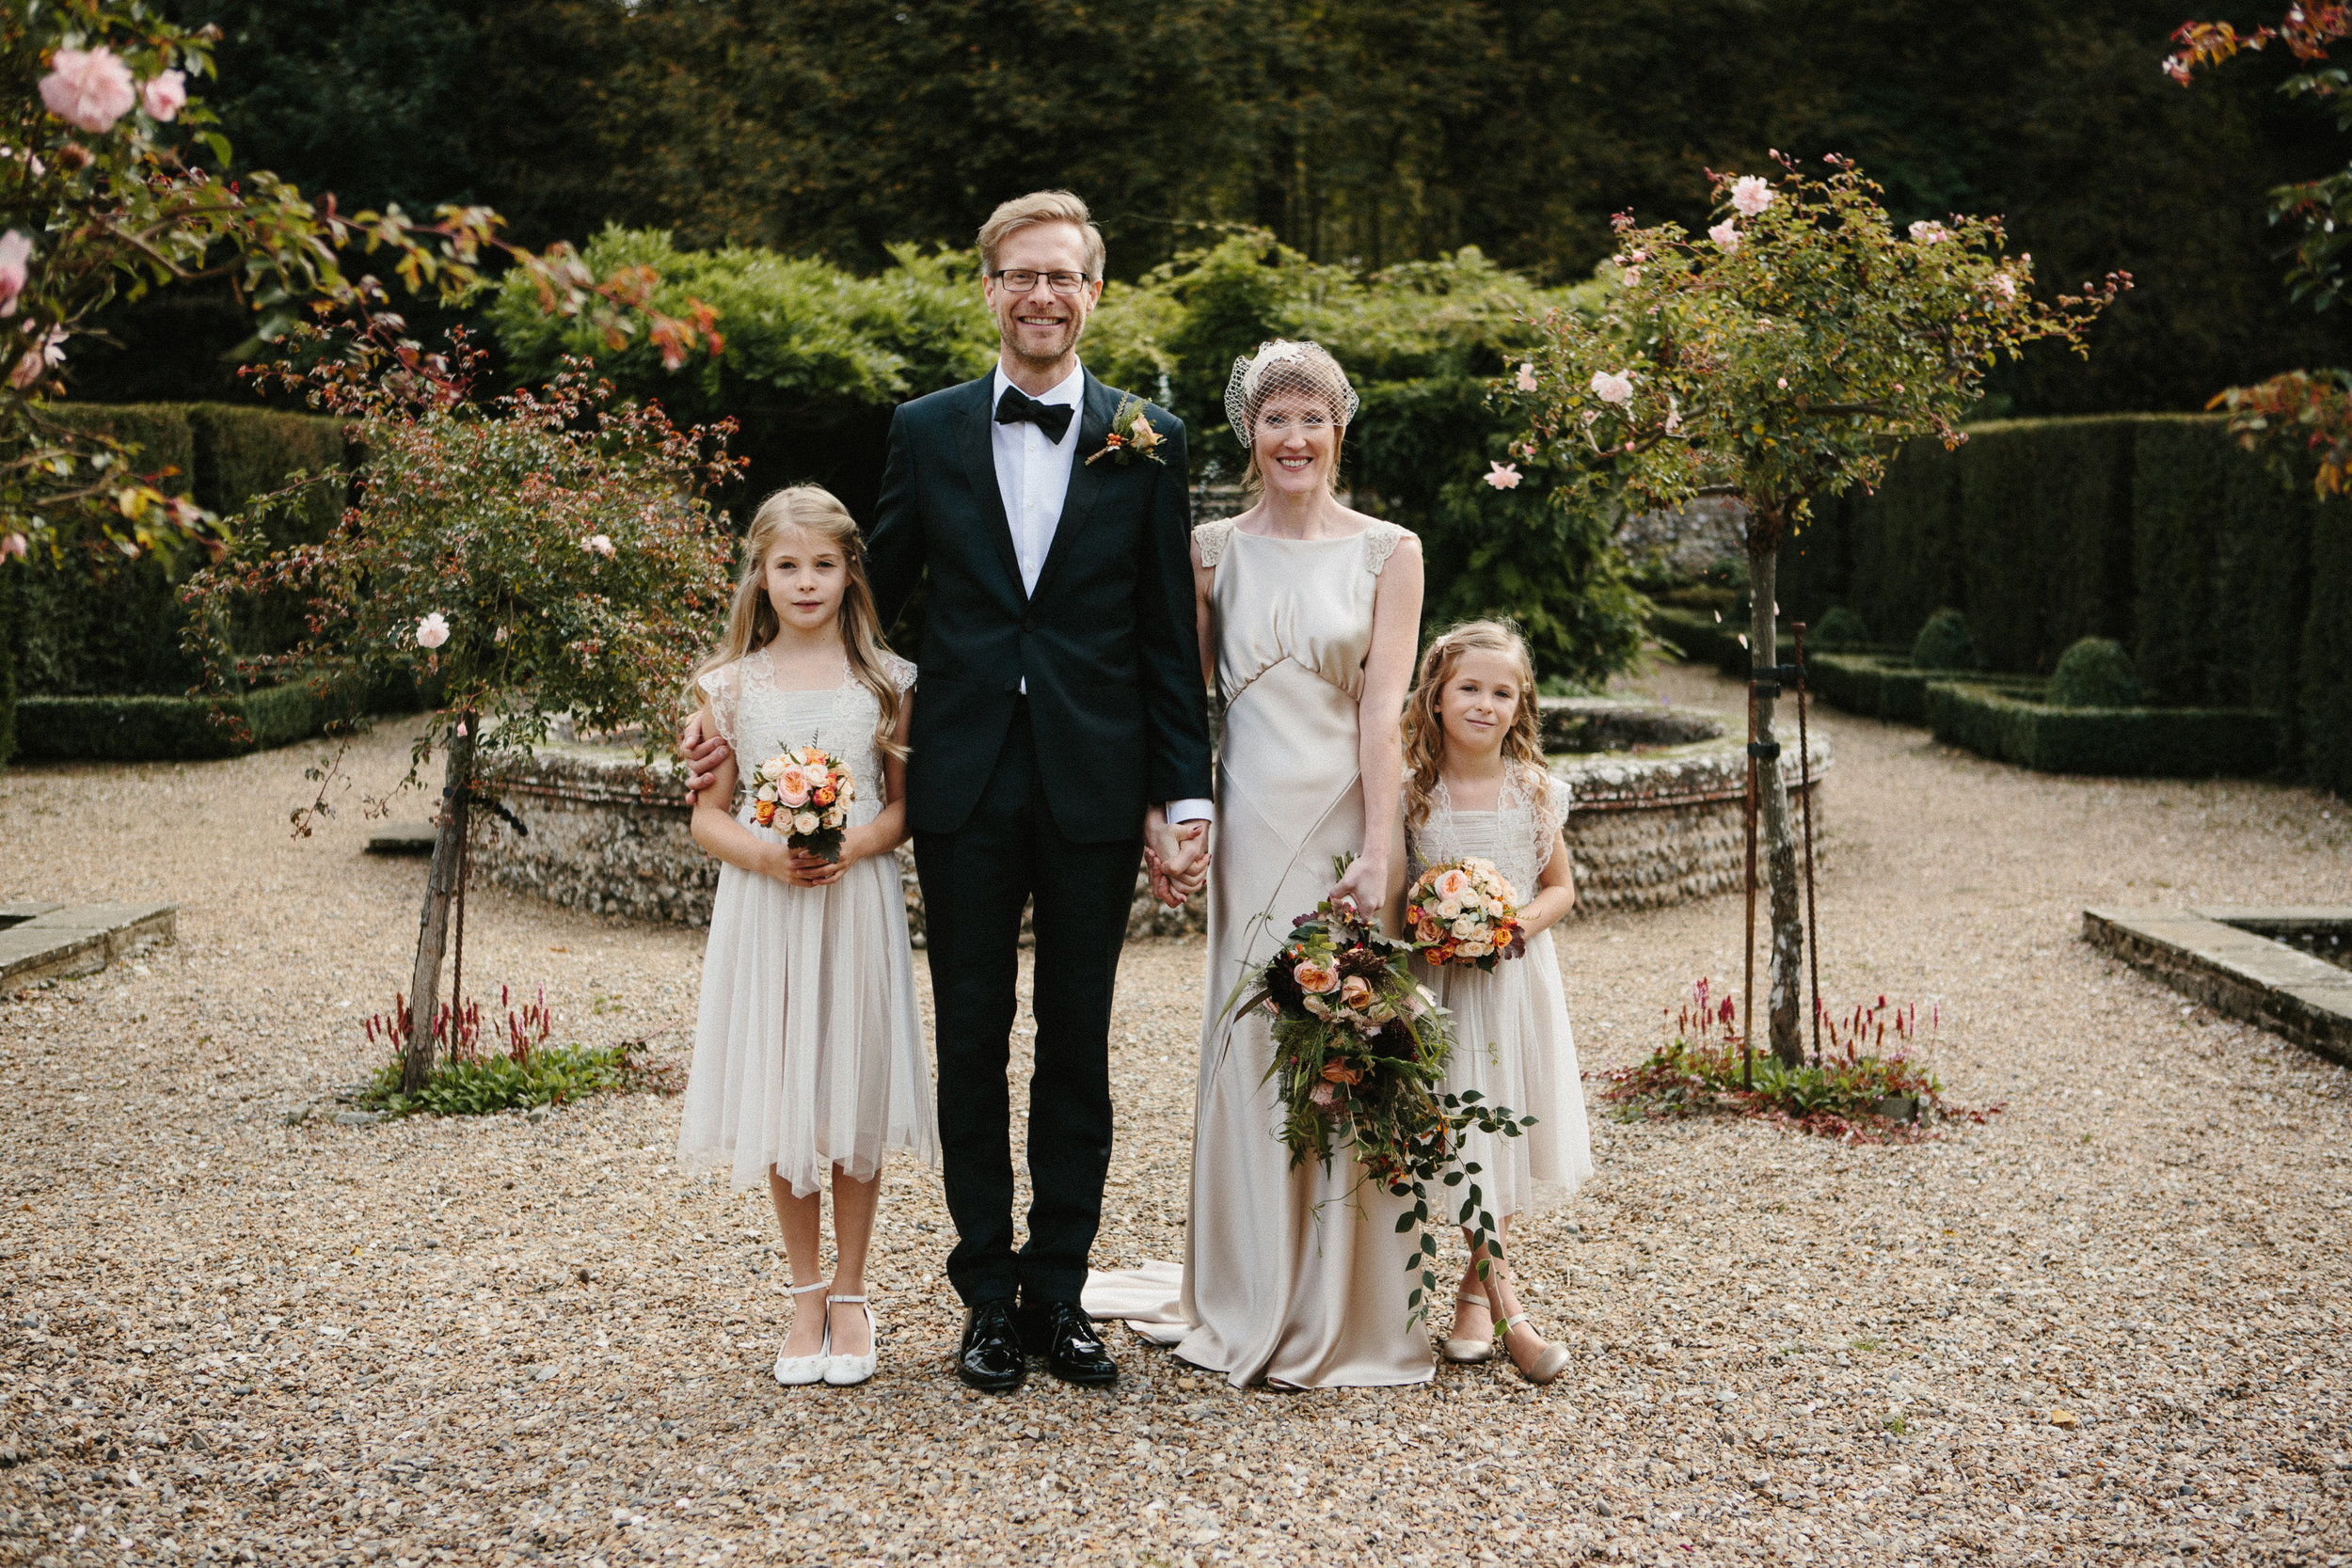 Kate-Beaumont-Sheffield-Honeysuckle-bias-cut-wedding-dress-oyster-Rosie19.jpg